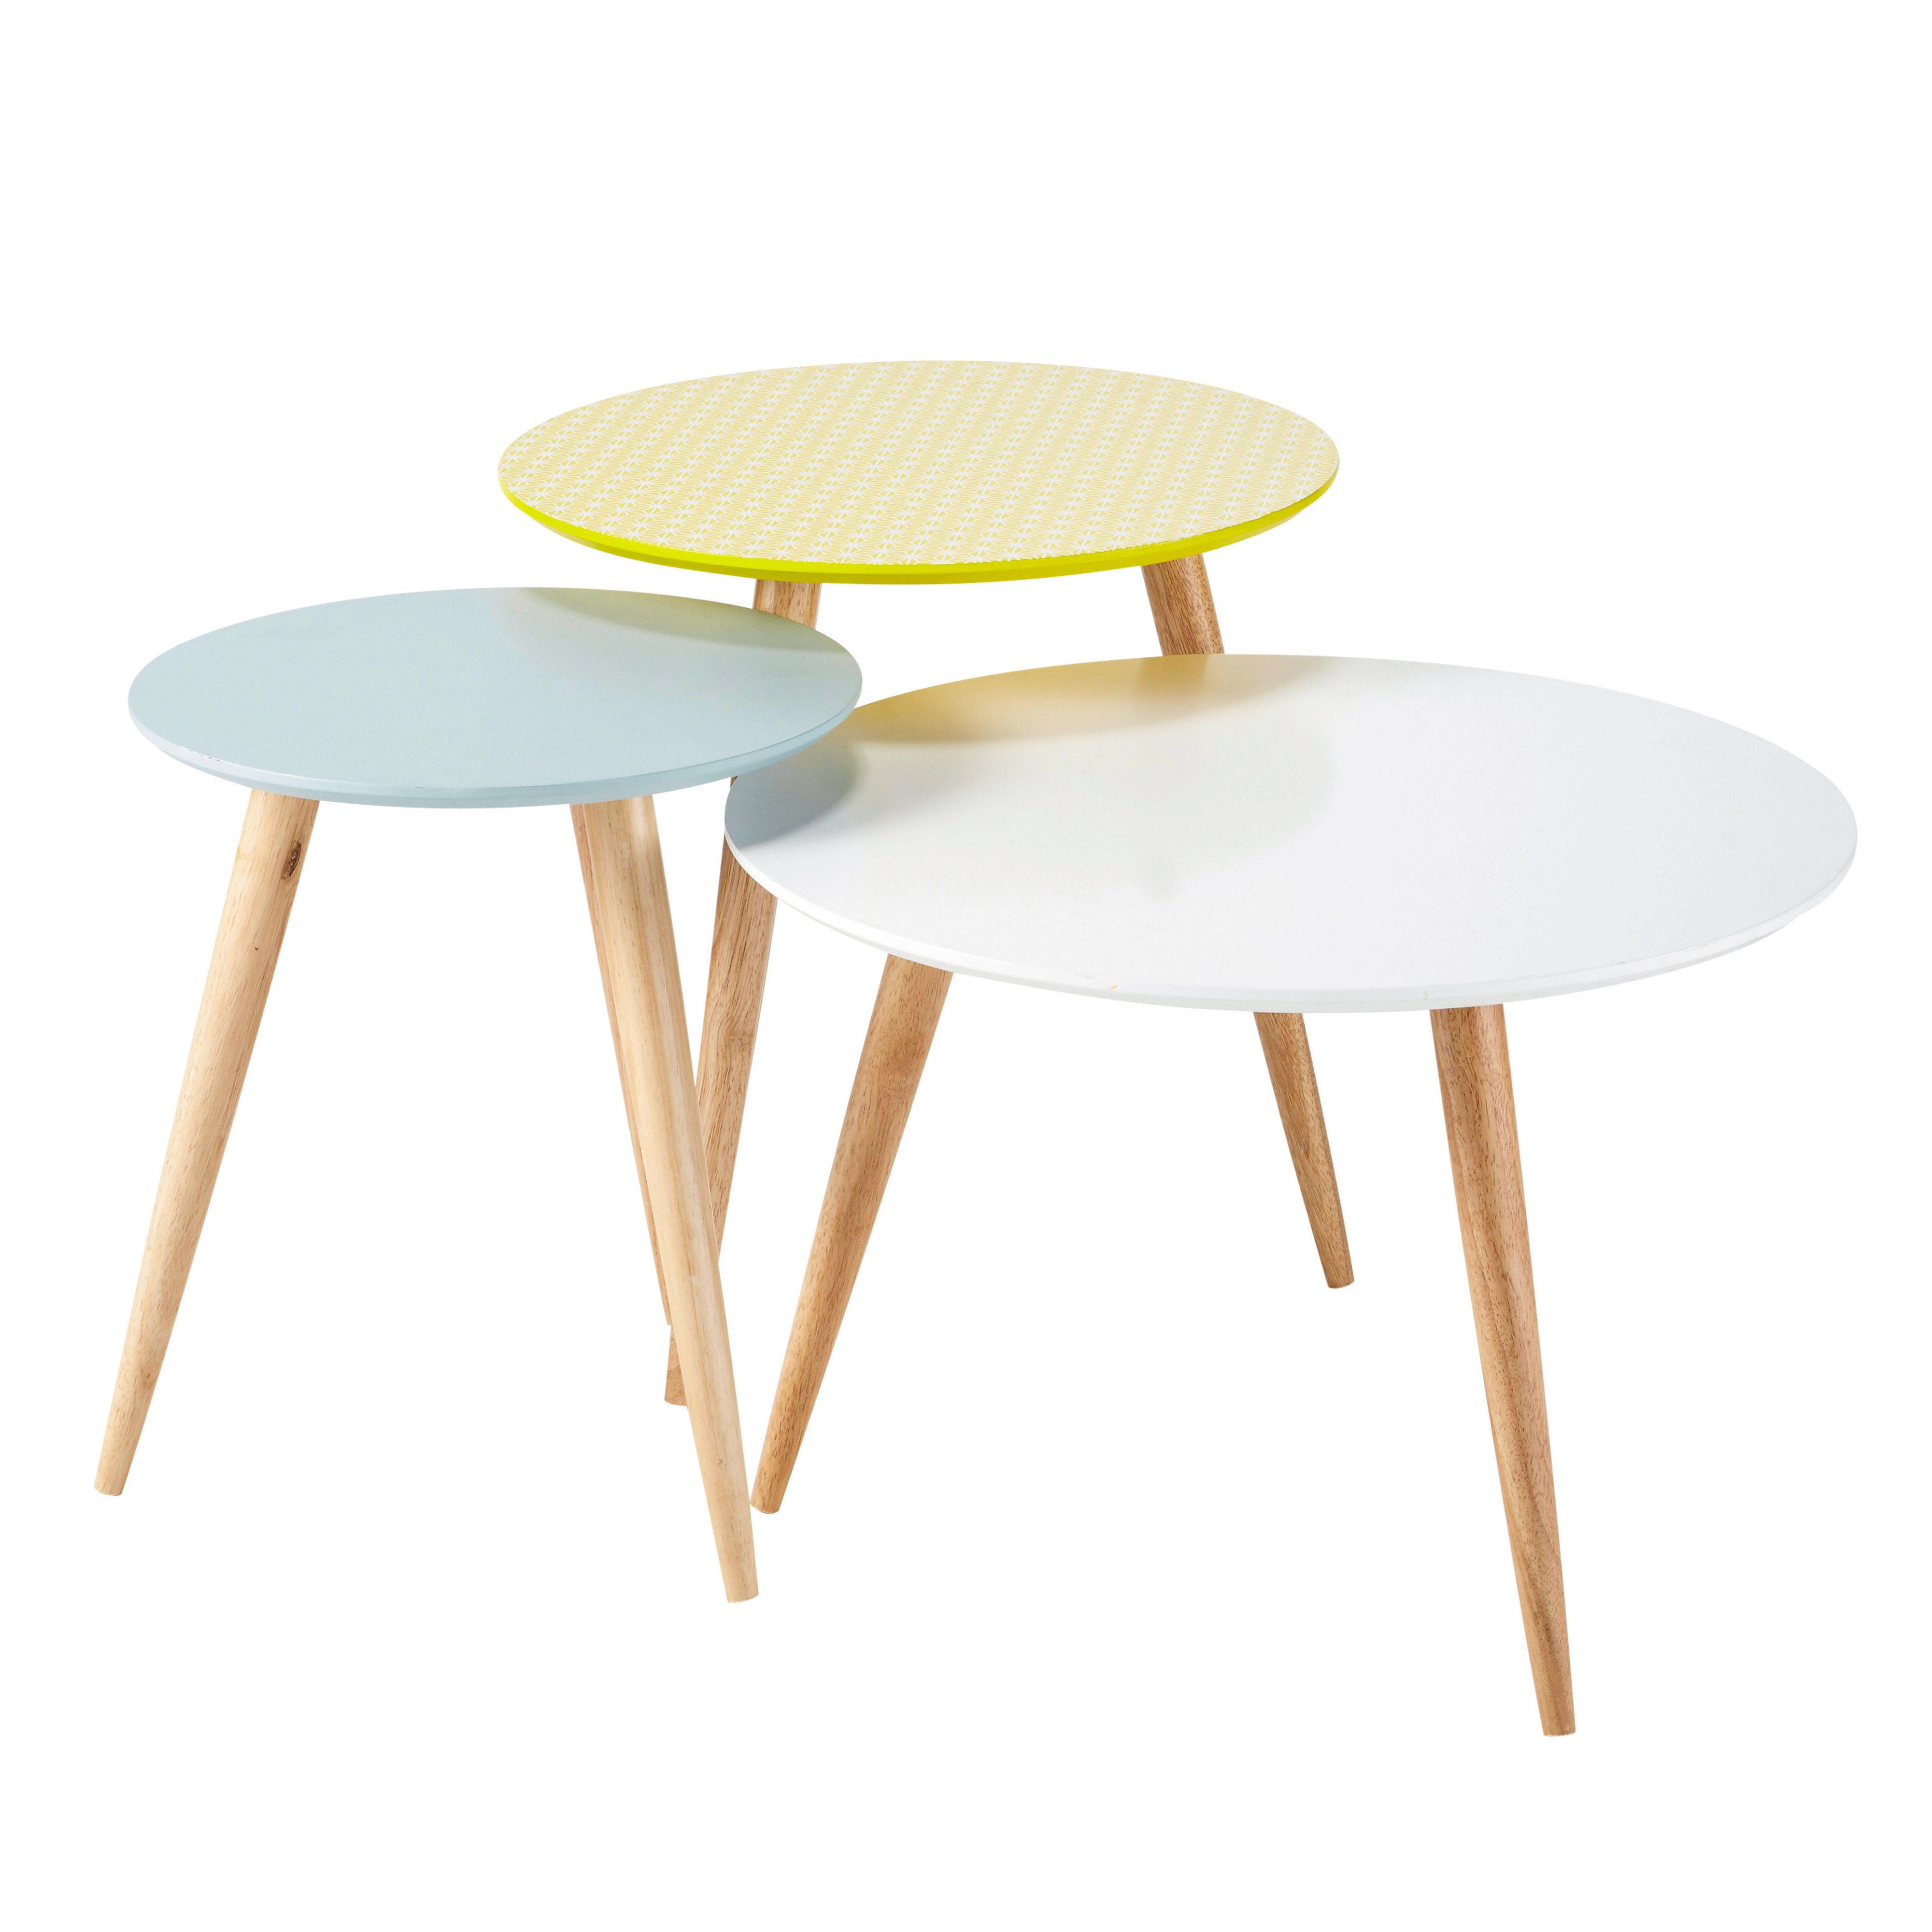 Petite table basse scandinave 40cm